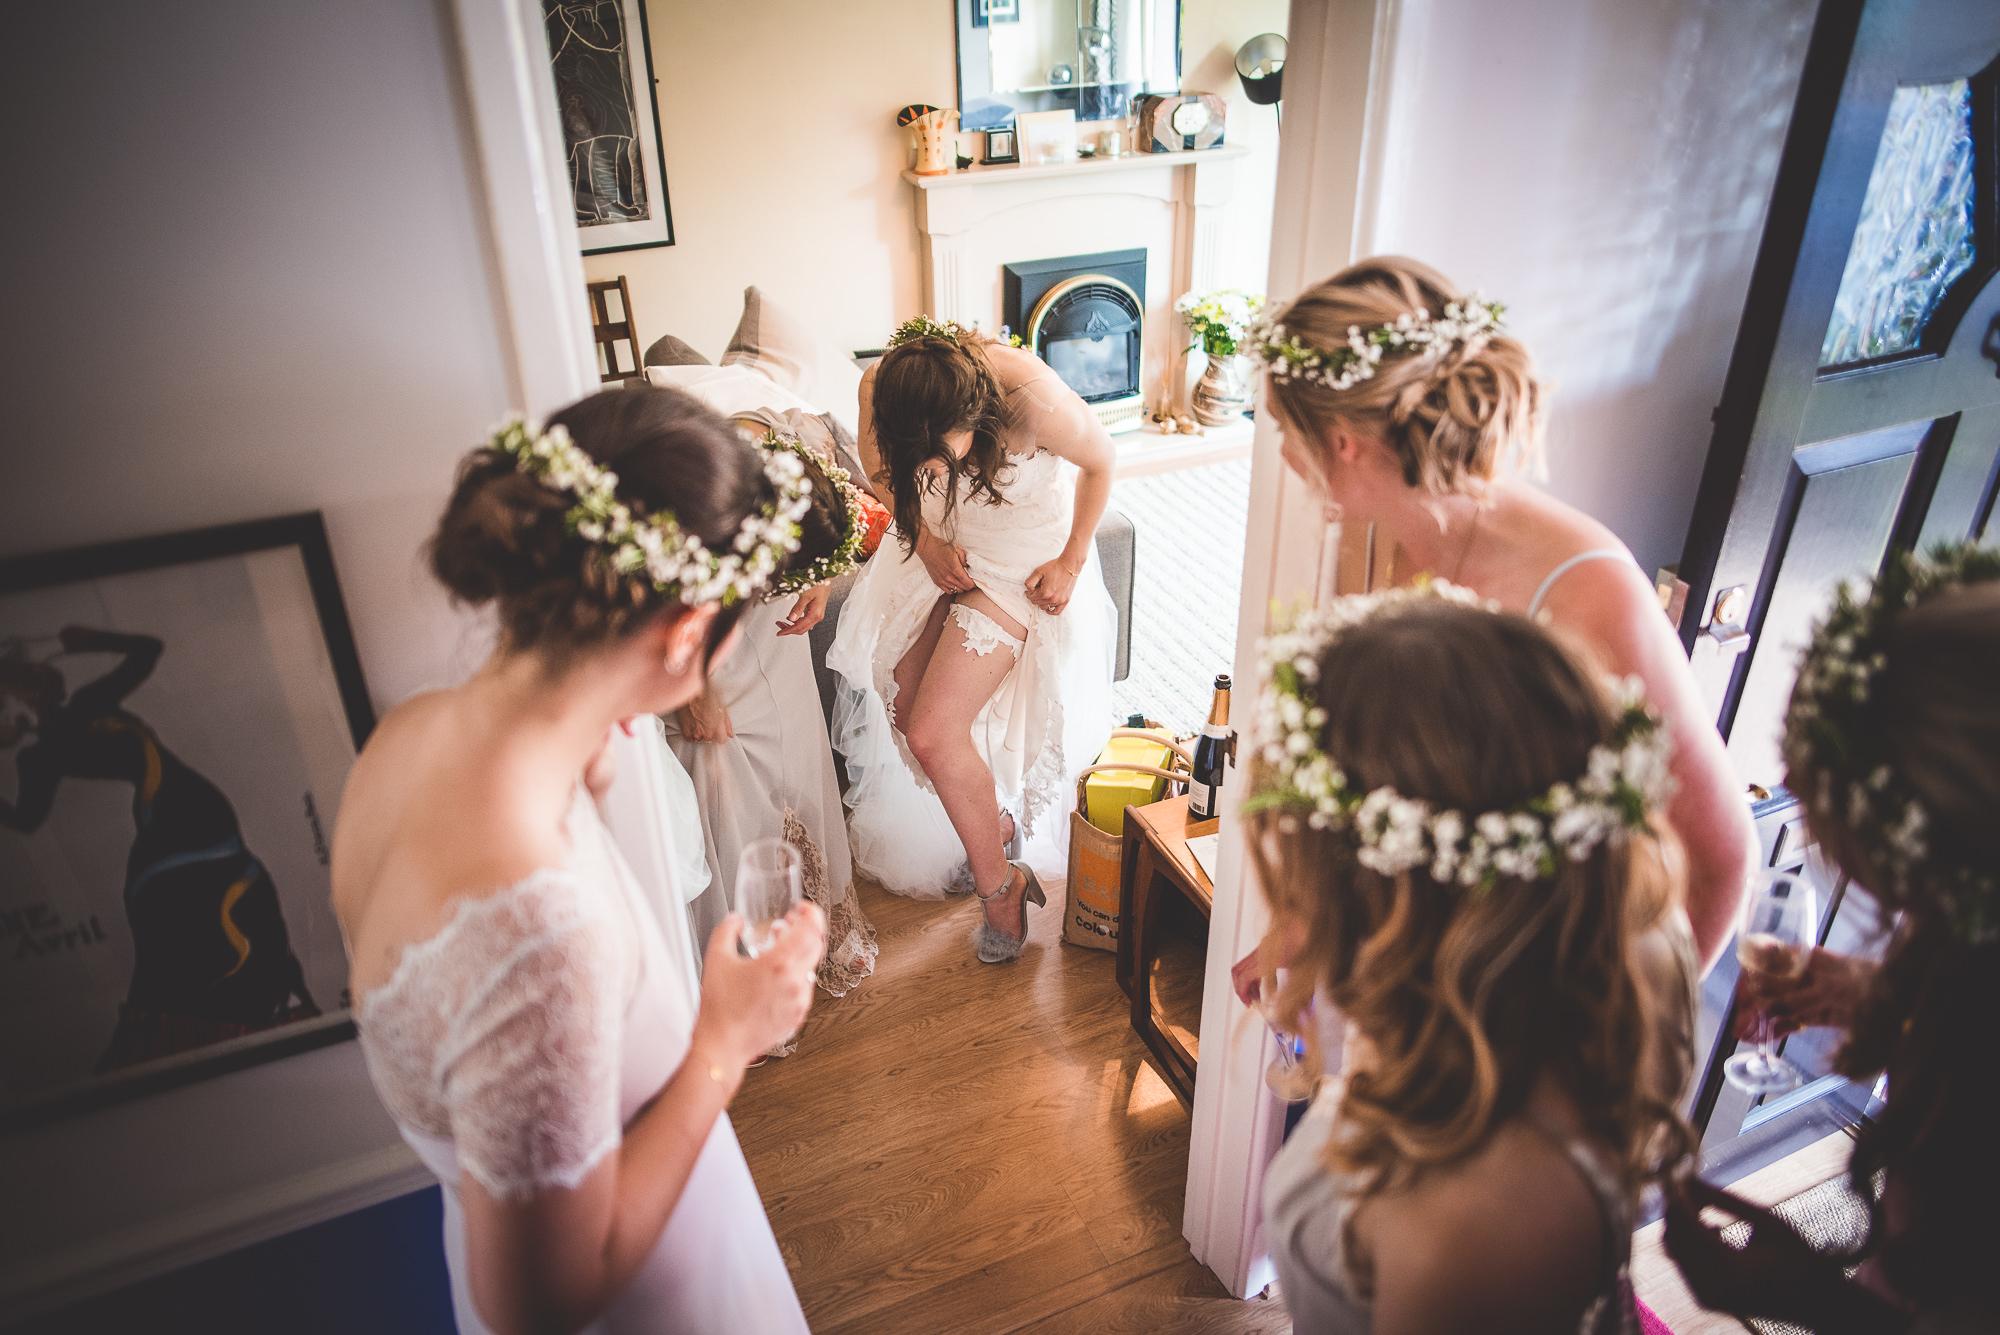 Veils & Bales Wedding Photography | Charlie & Steve SCSS 054